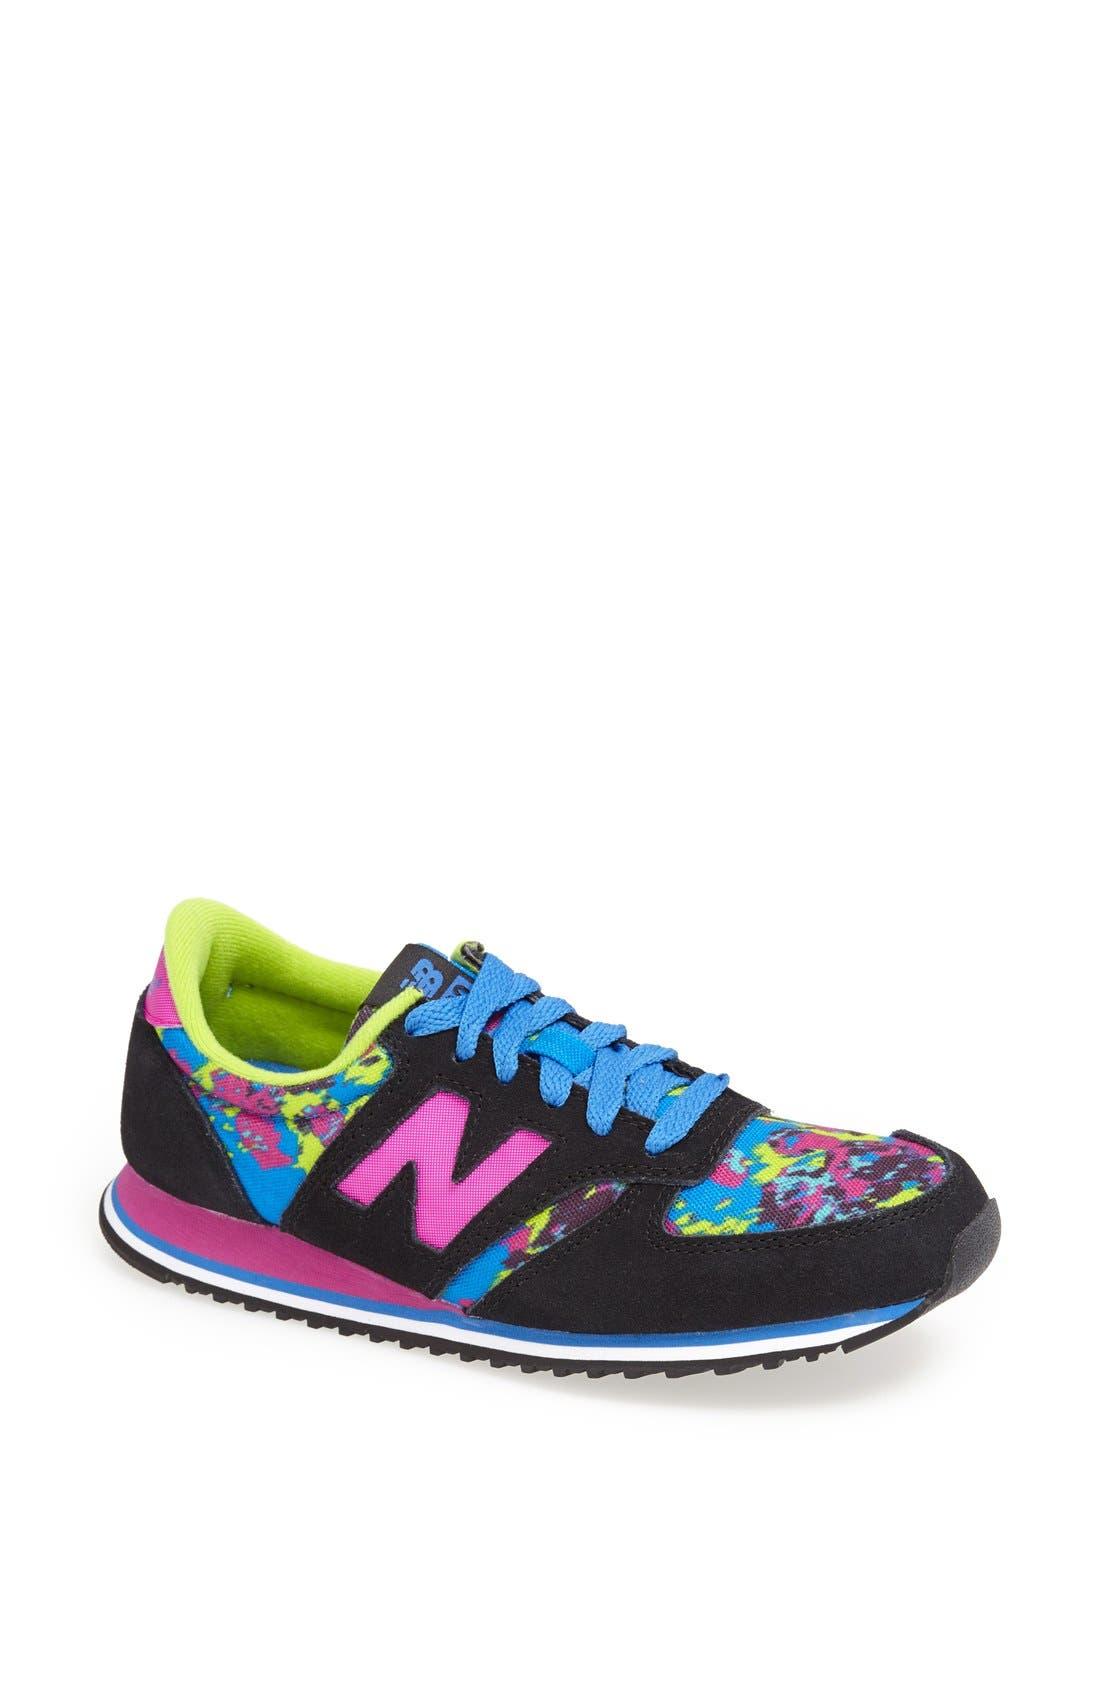 Alternate Image 1 Selected - New Balance '420 Tomboy' Sneaker (Women)